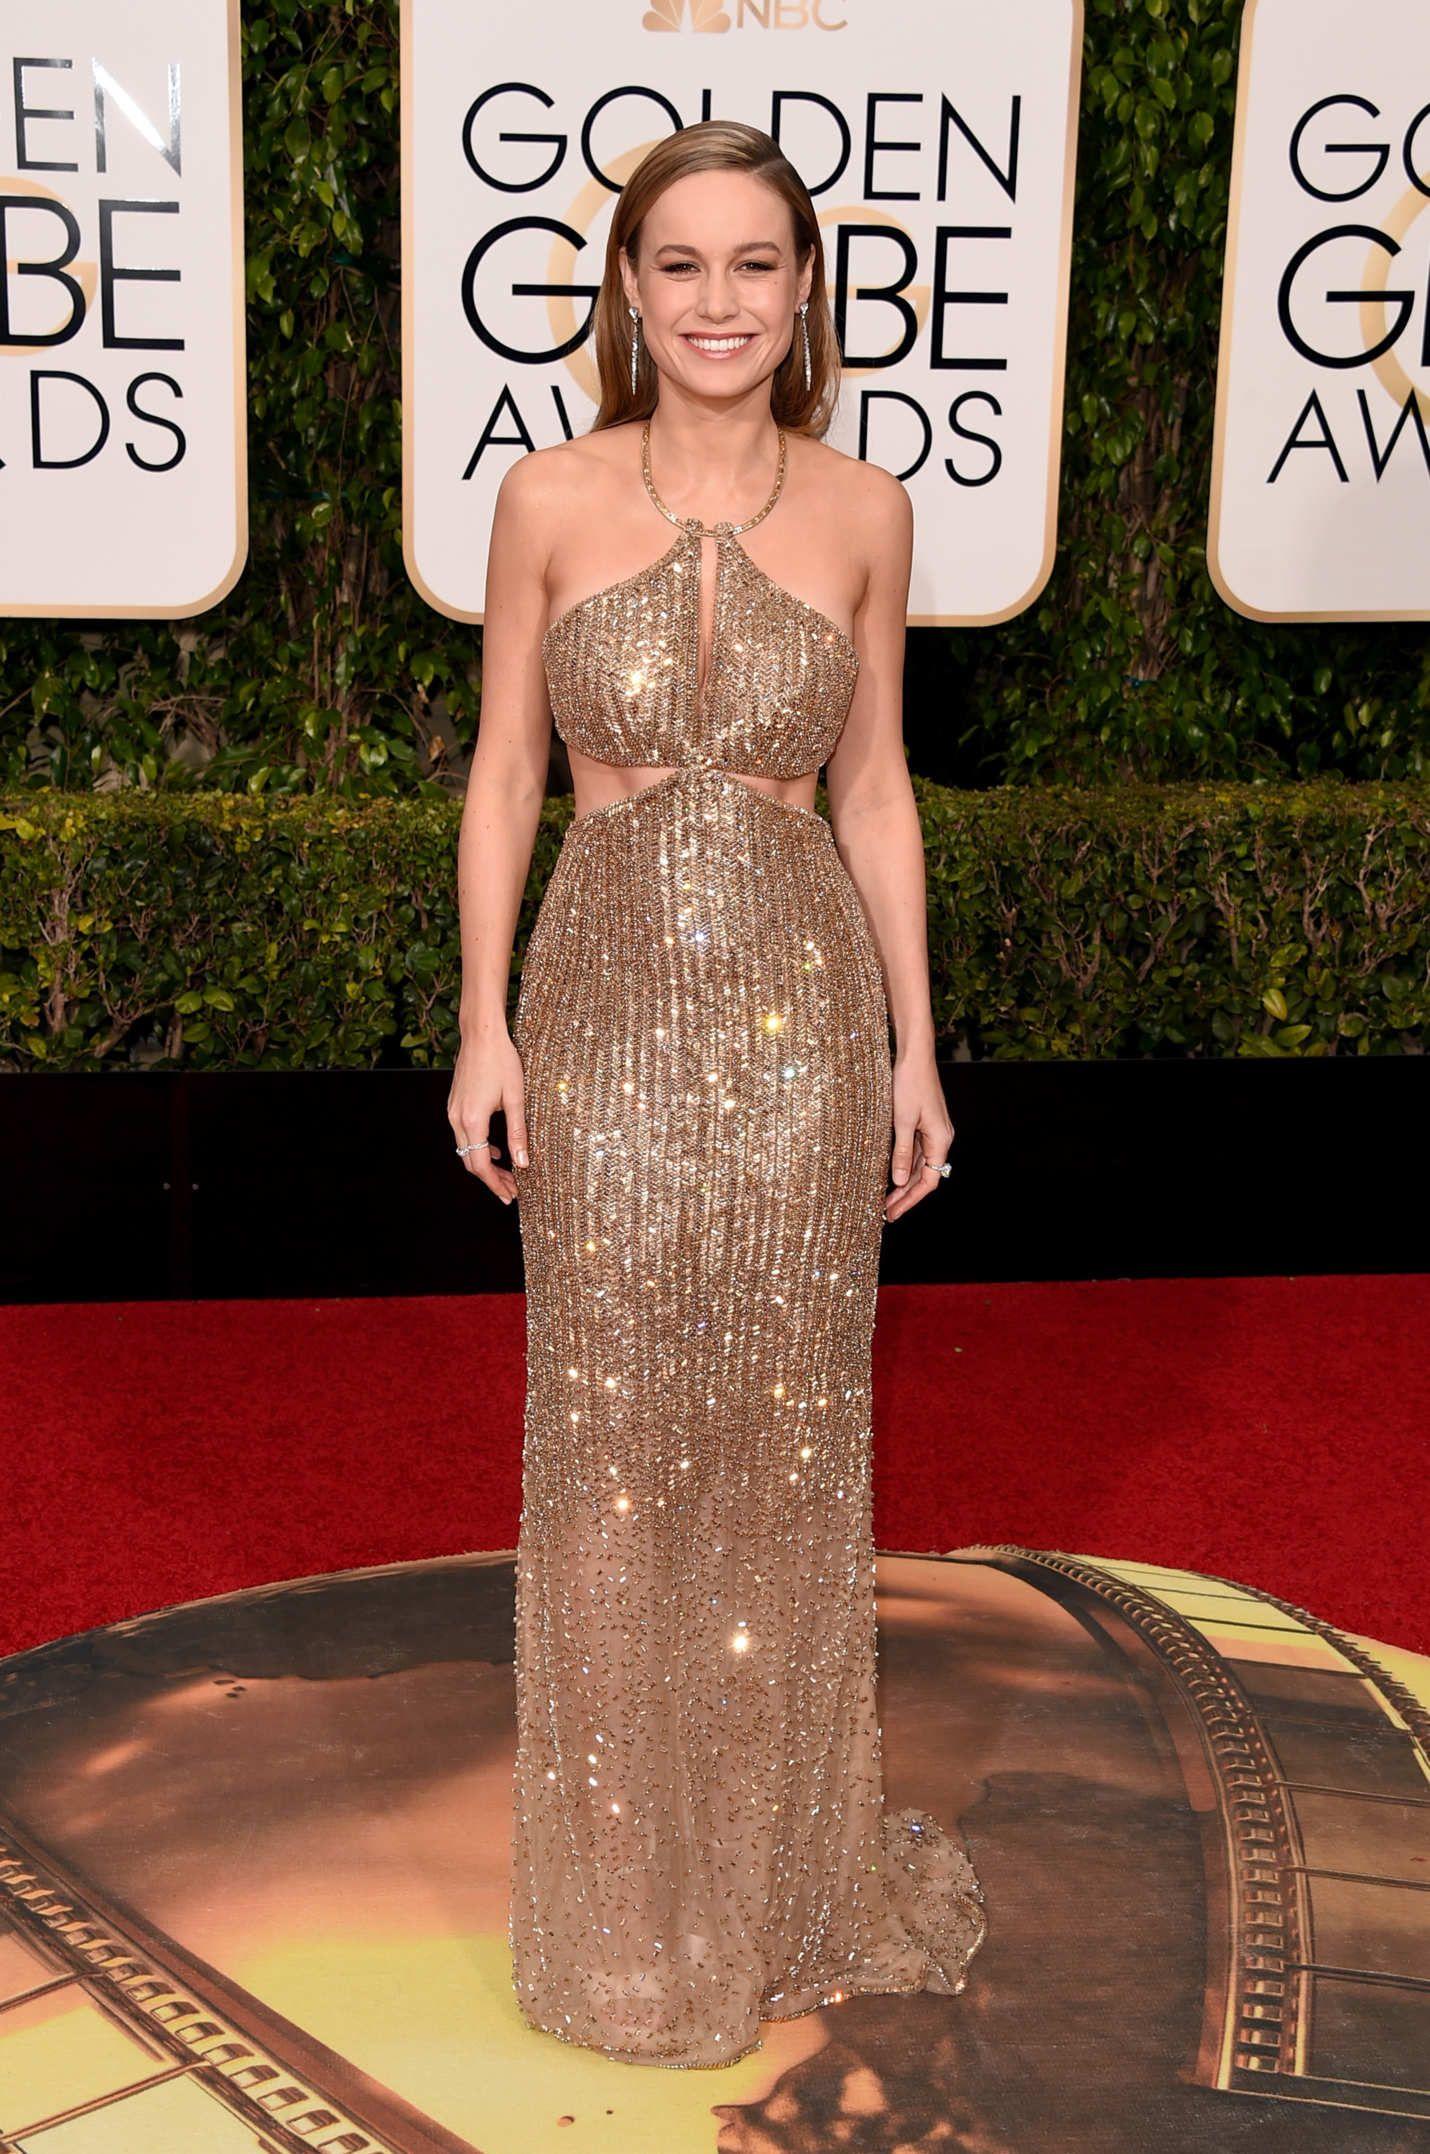 Brie Larson - Golden Globes 2016